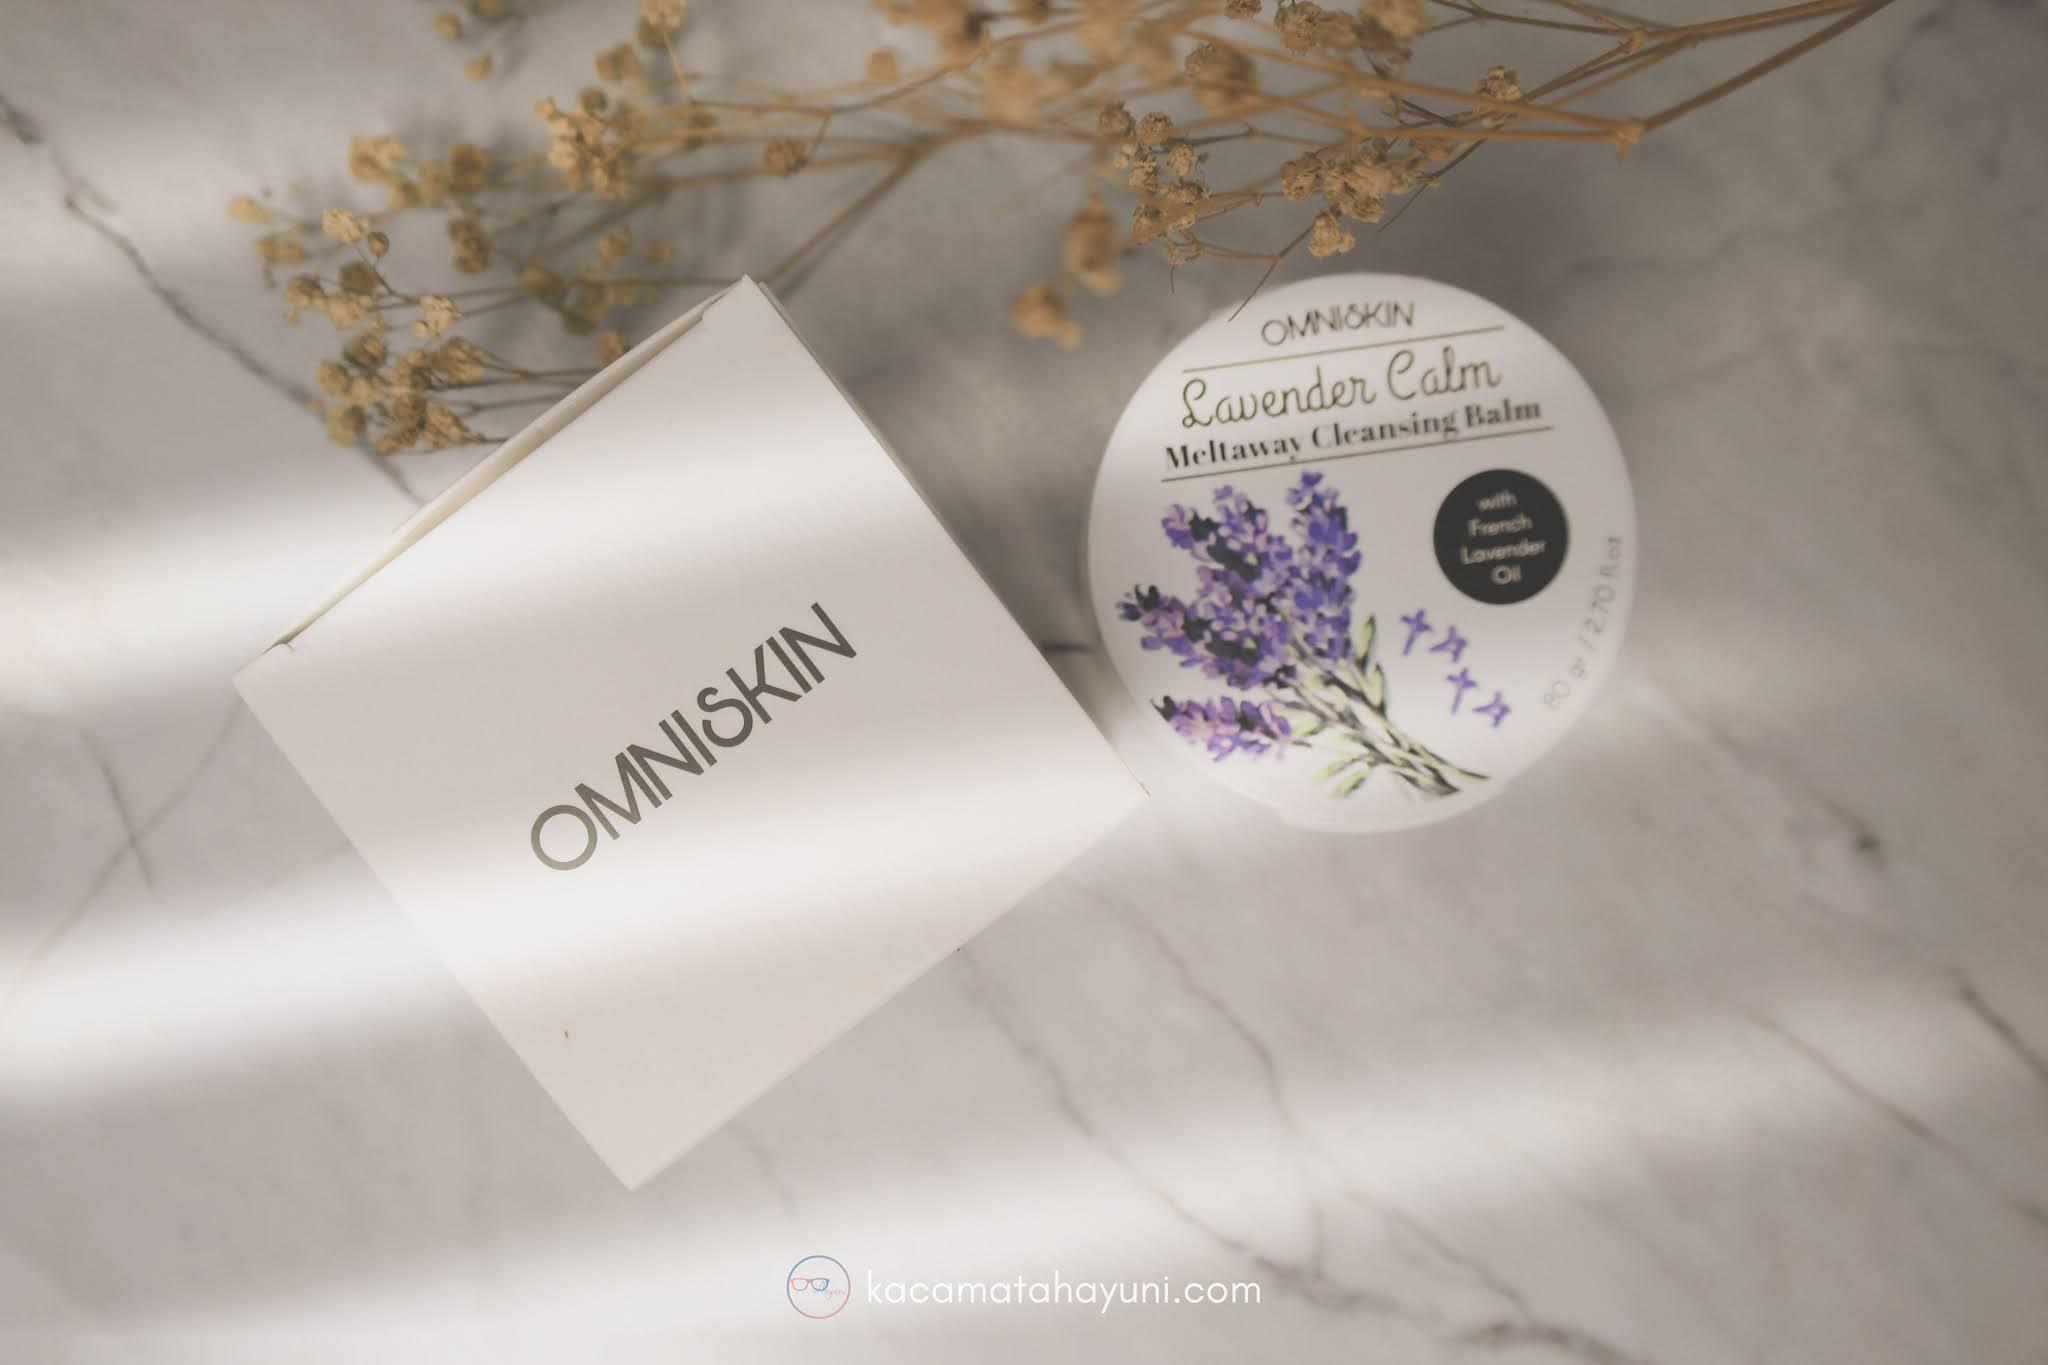 review-omniskin-lavender-calm-meltaway-cleansing-balm